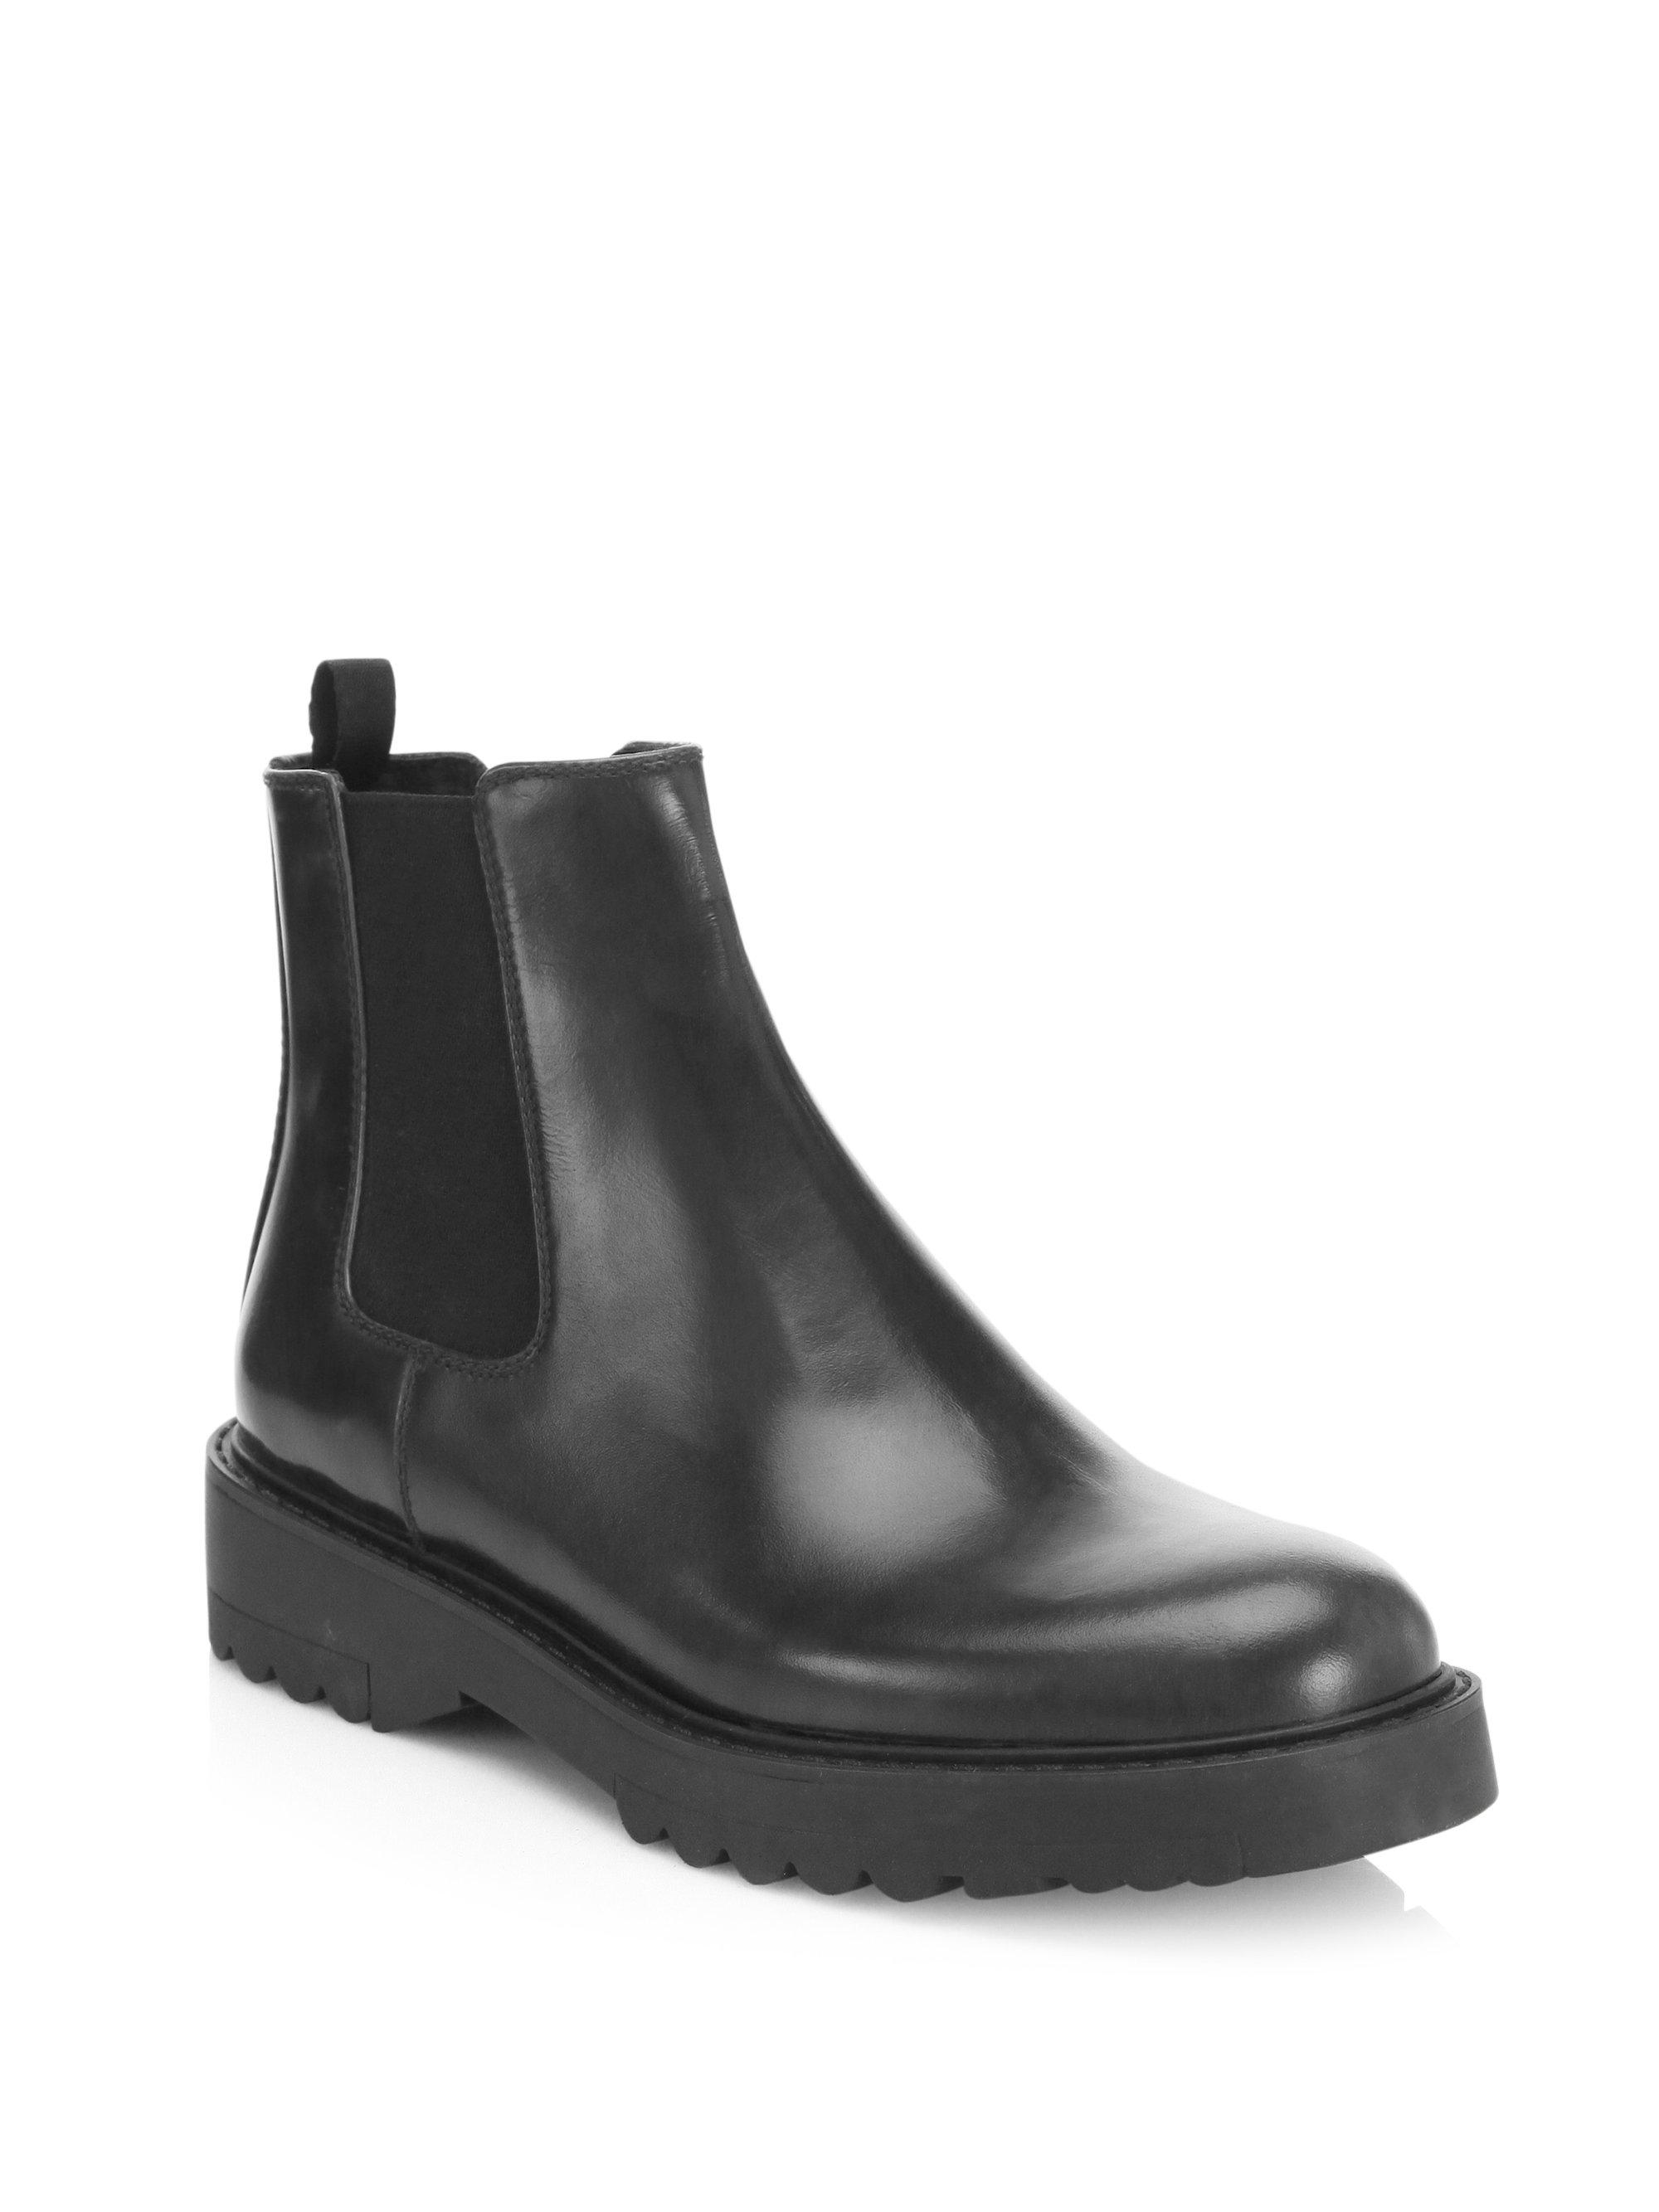 6406da6c98e2 Lyst - Prada Lug Sole Leather Chelsea Booties in Black